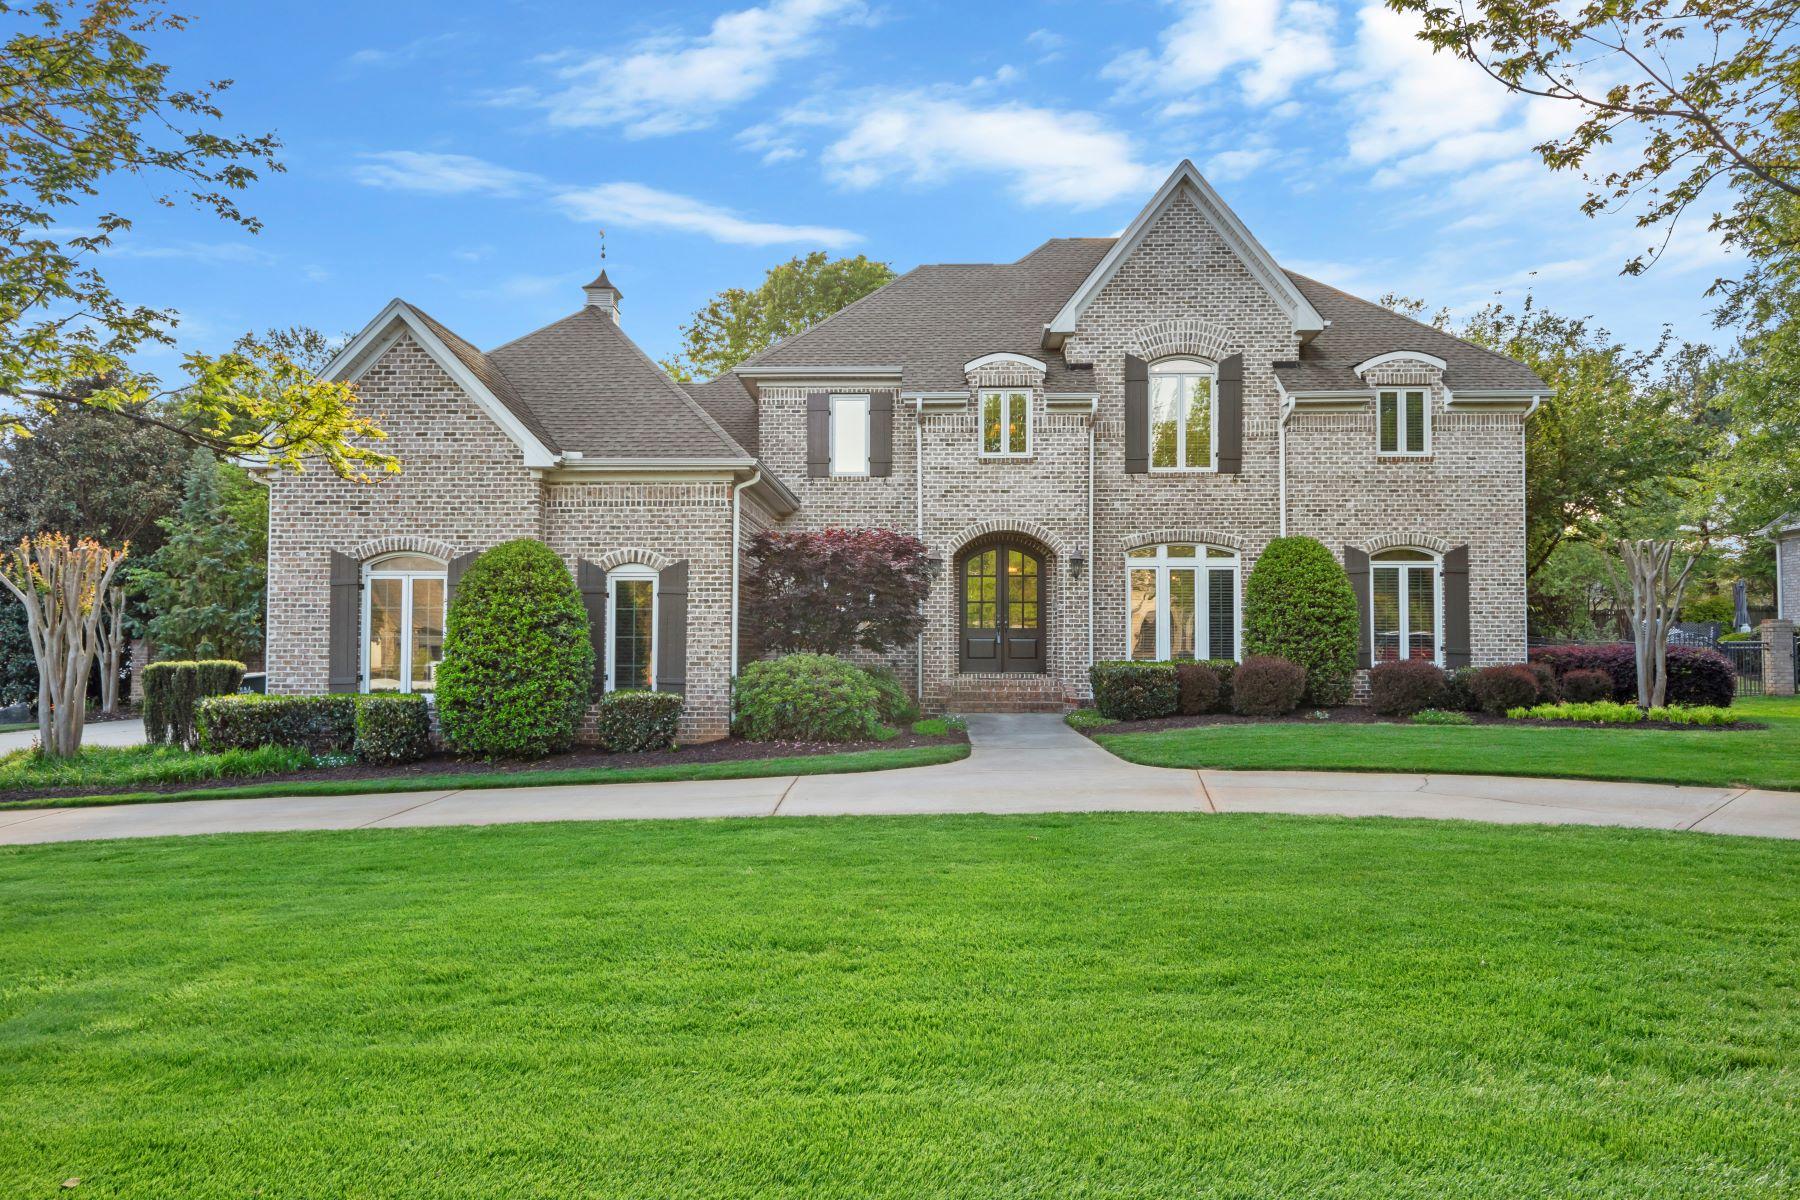 Single Family Homes για την Πώληση στο 14 Finsbury Lane, Simpsonville, SC 29681 Simpsonville, Νότια Καρολίνα 29681 Ηνωμένες Πολιτείες